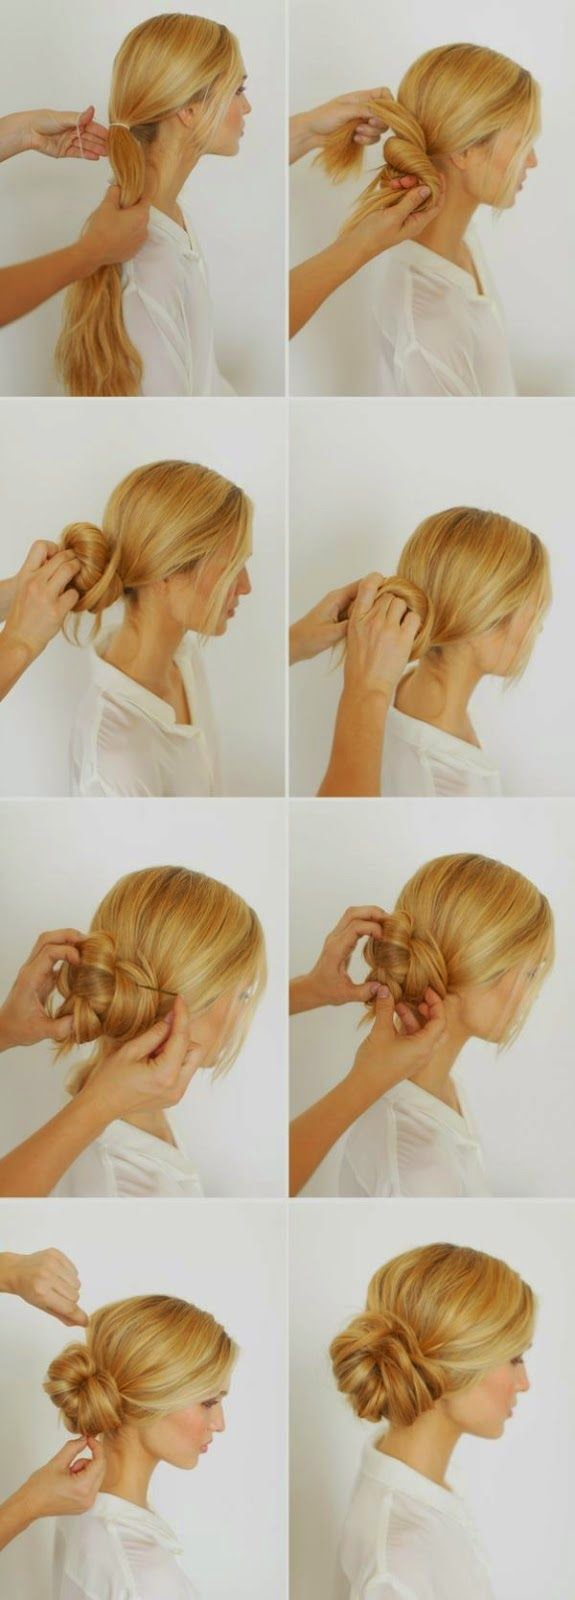 http://s-fashion-avenue.blogspot.it/2014/10/dresses-hairstyles.html